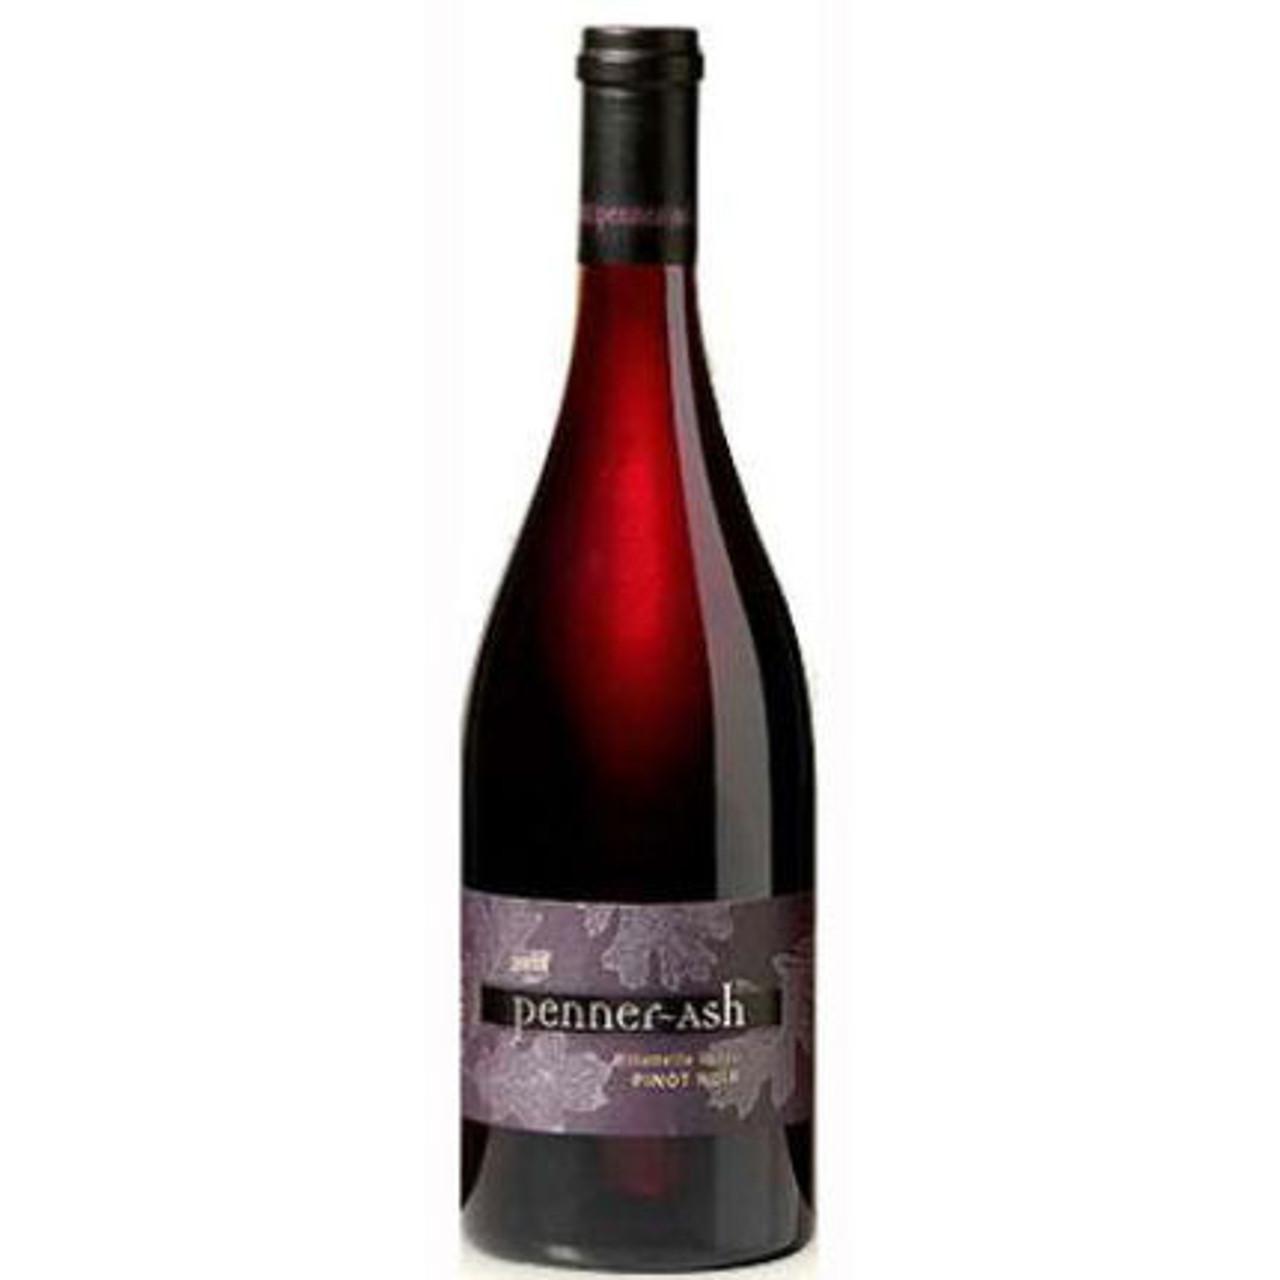 Penner-Ash Willamette Pinot Noir Oregon